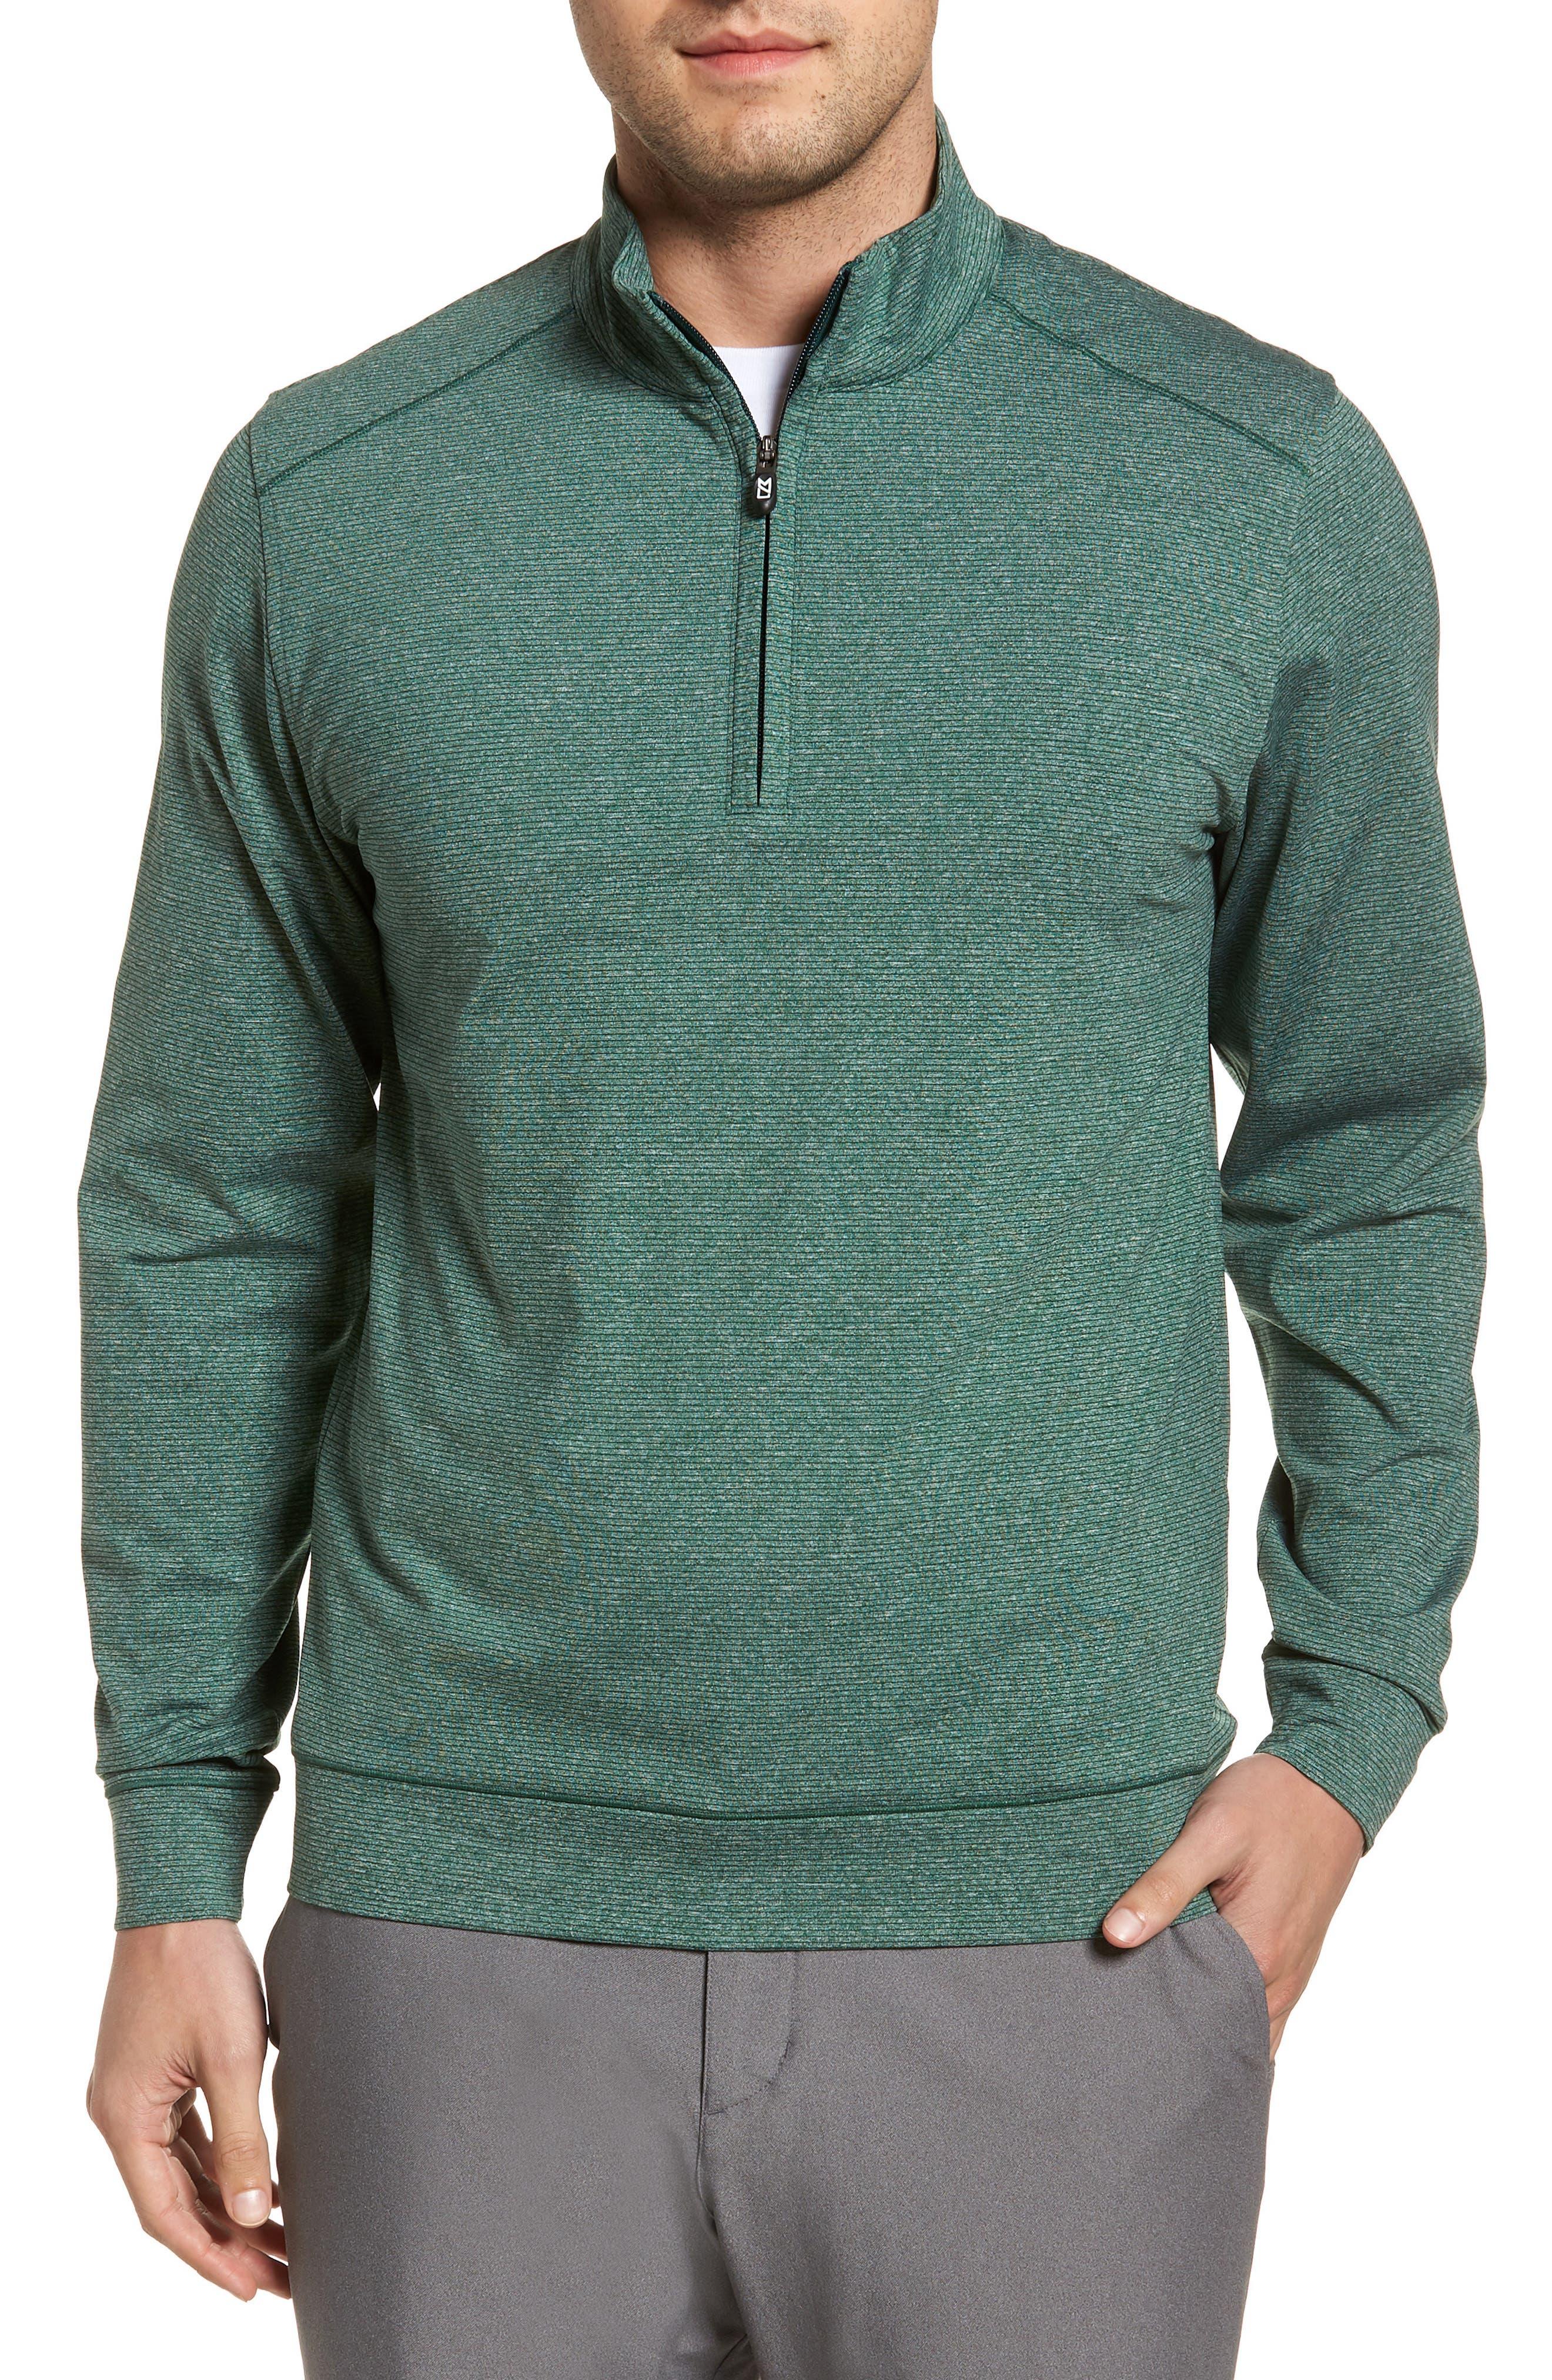 CUTTER & BUCK Shoreline Classic Fit Half Zip Pullover, Main, color, HUNTER HEATHER